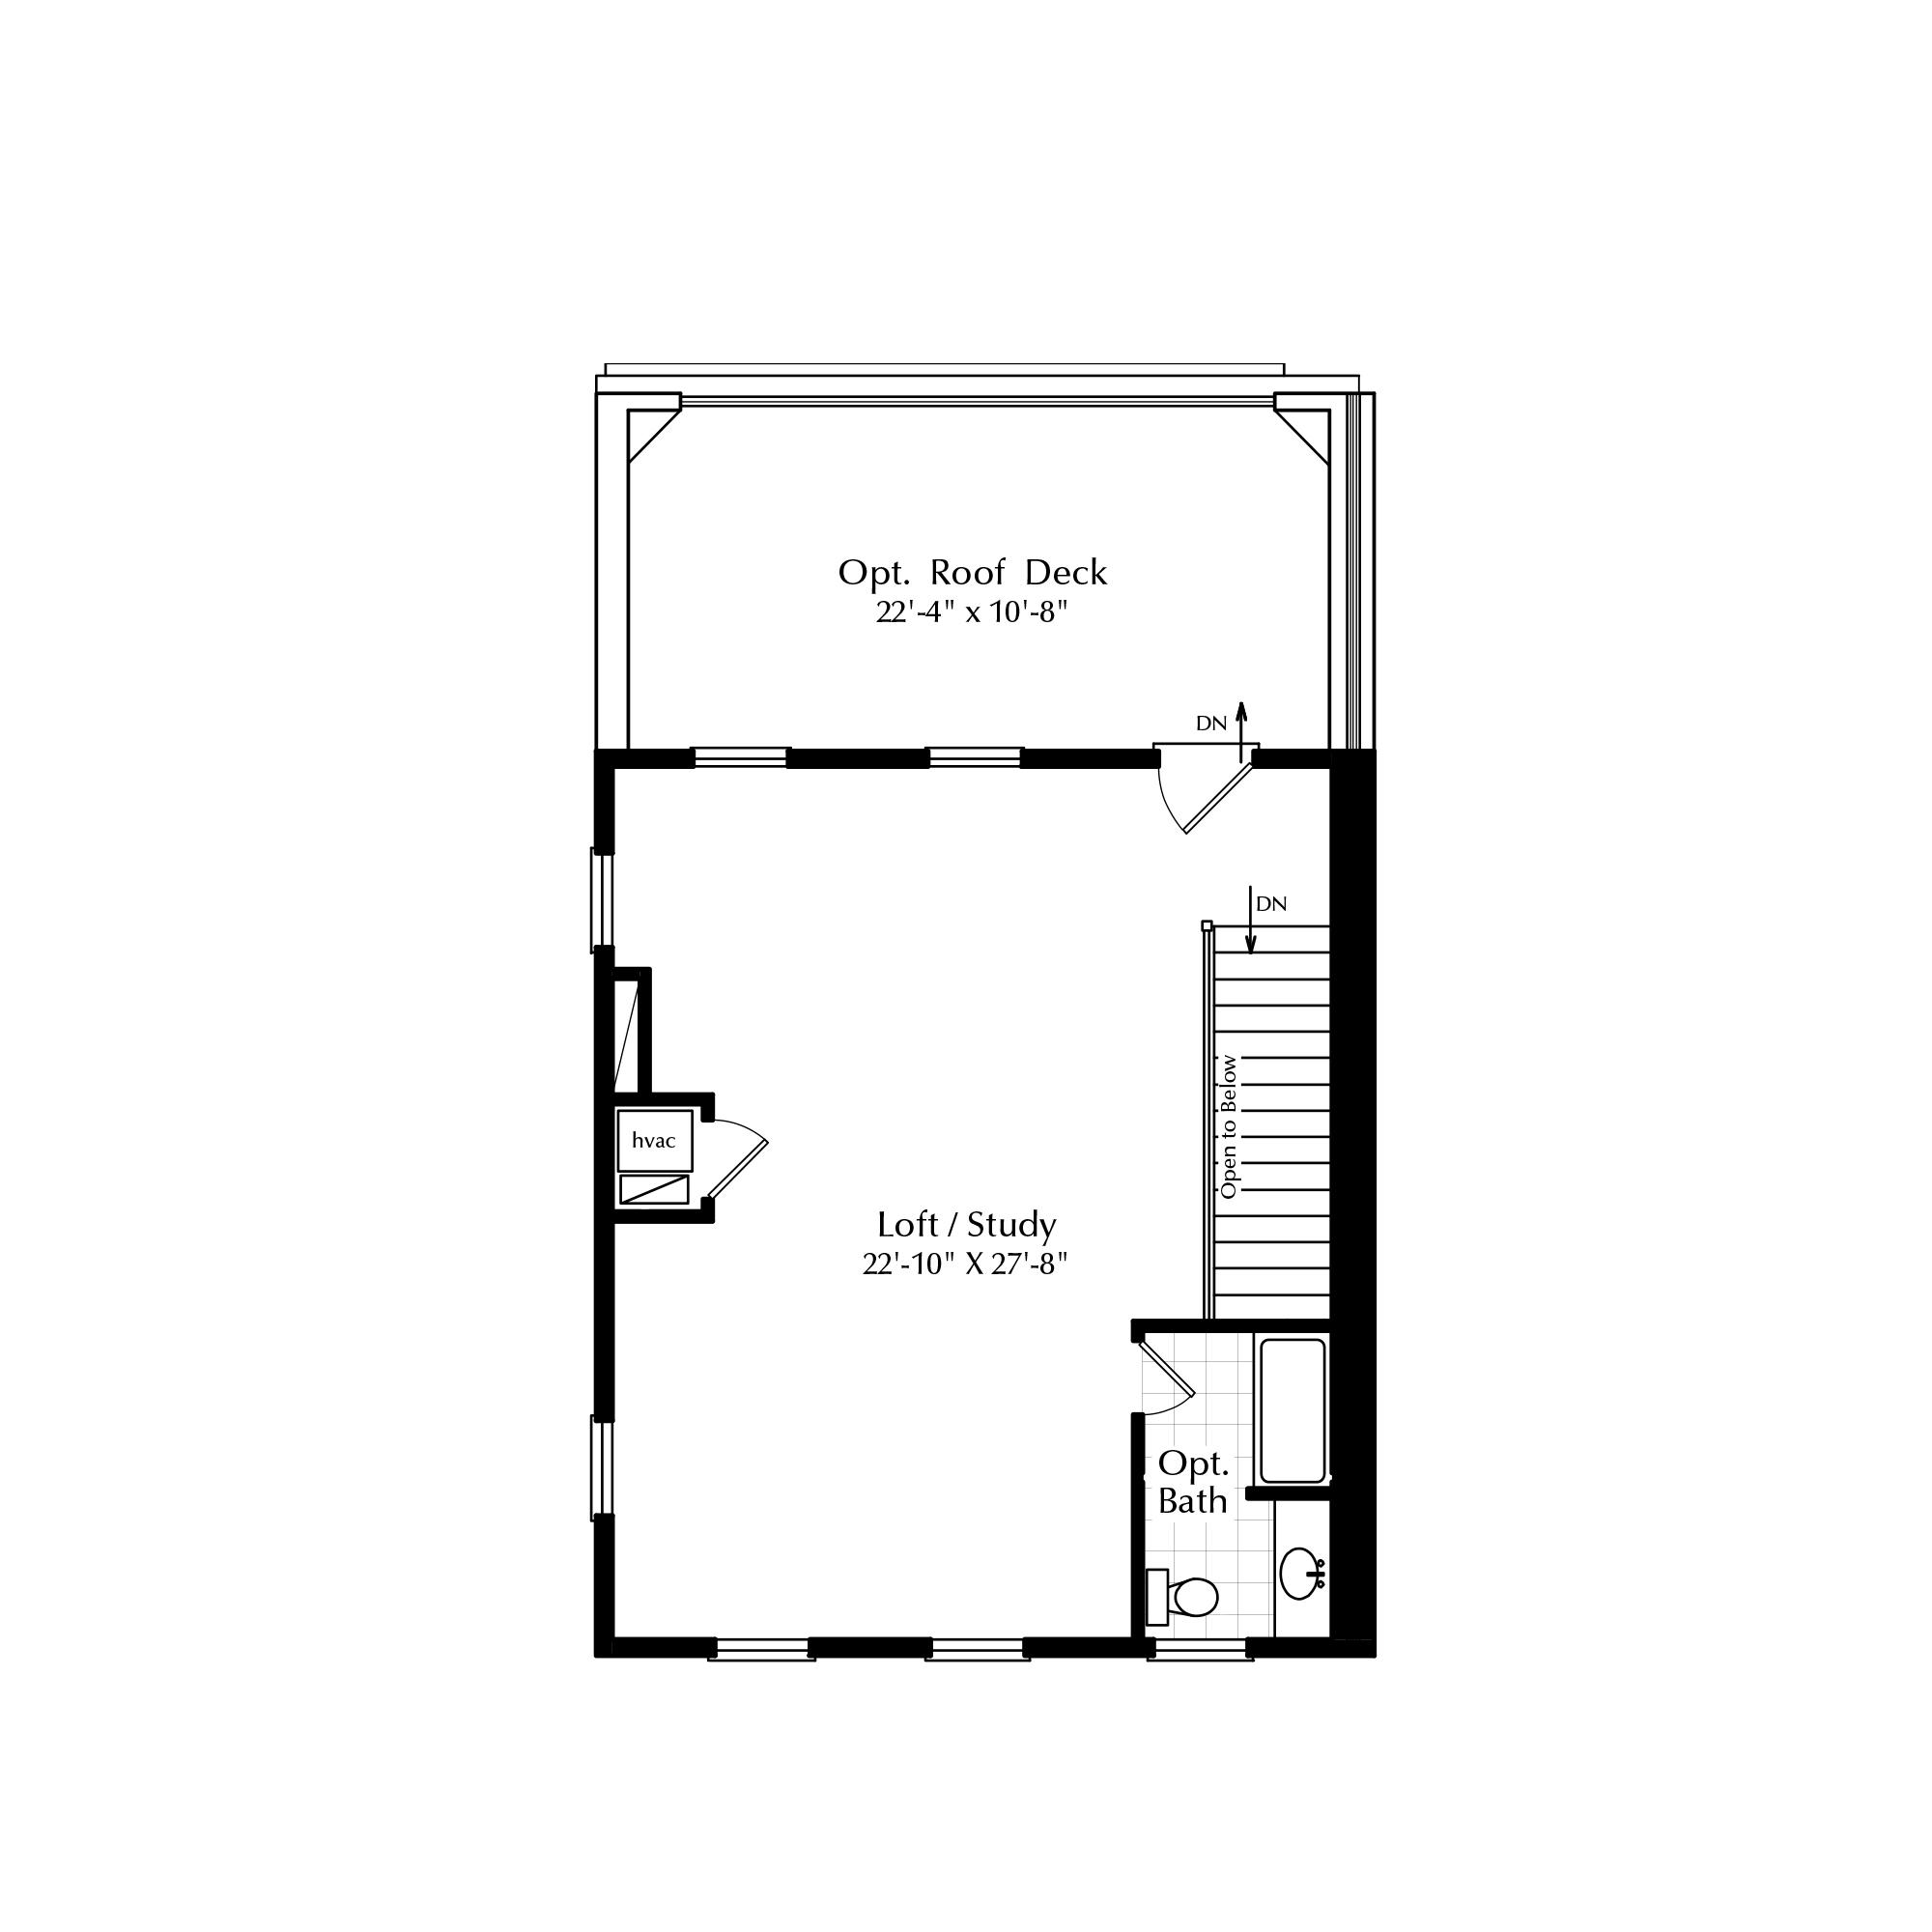 Standard Third Floor Loft